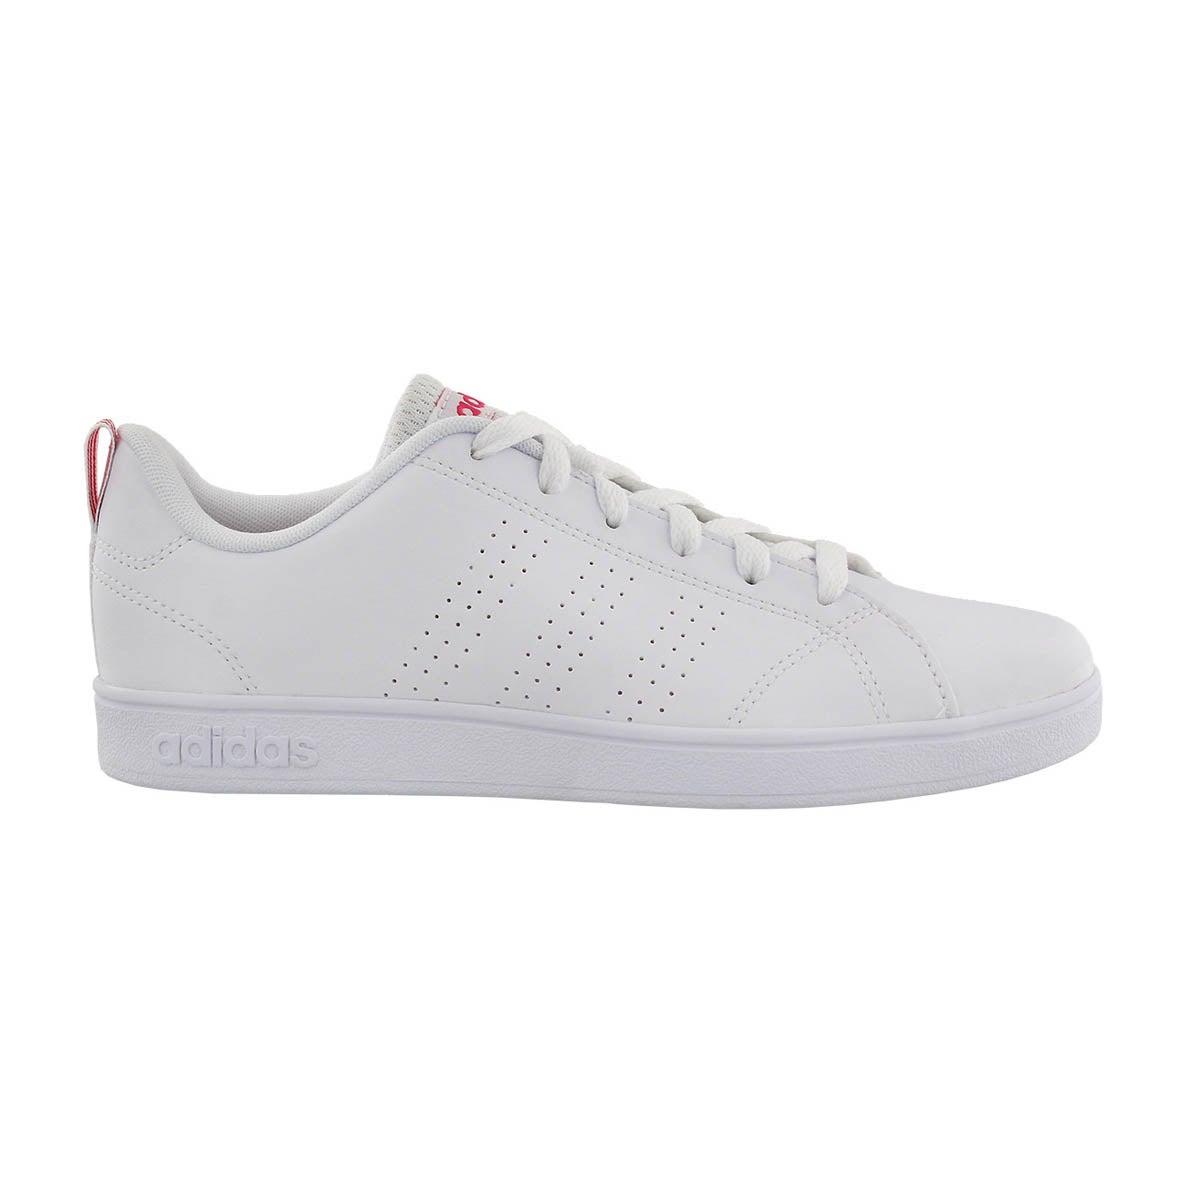 Grls Advantage Clean wht/pnk sneaker